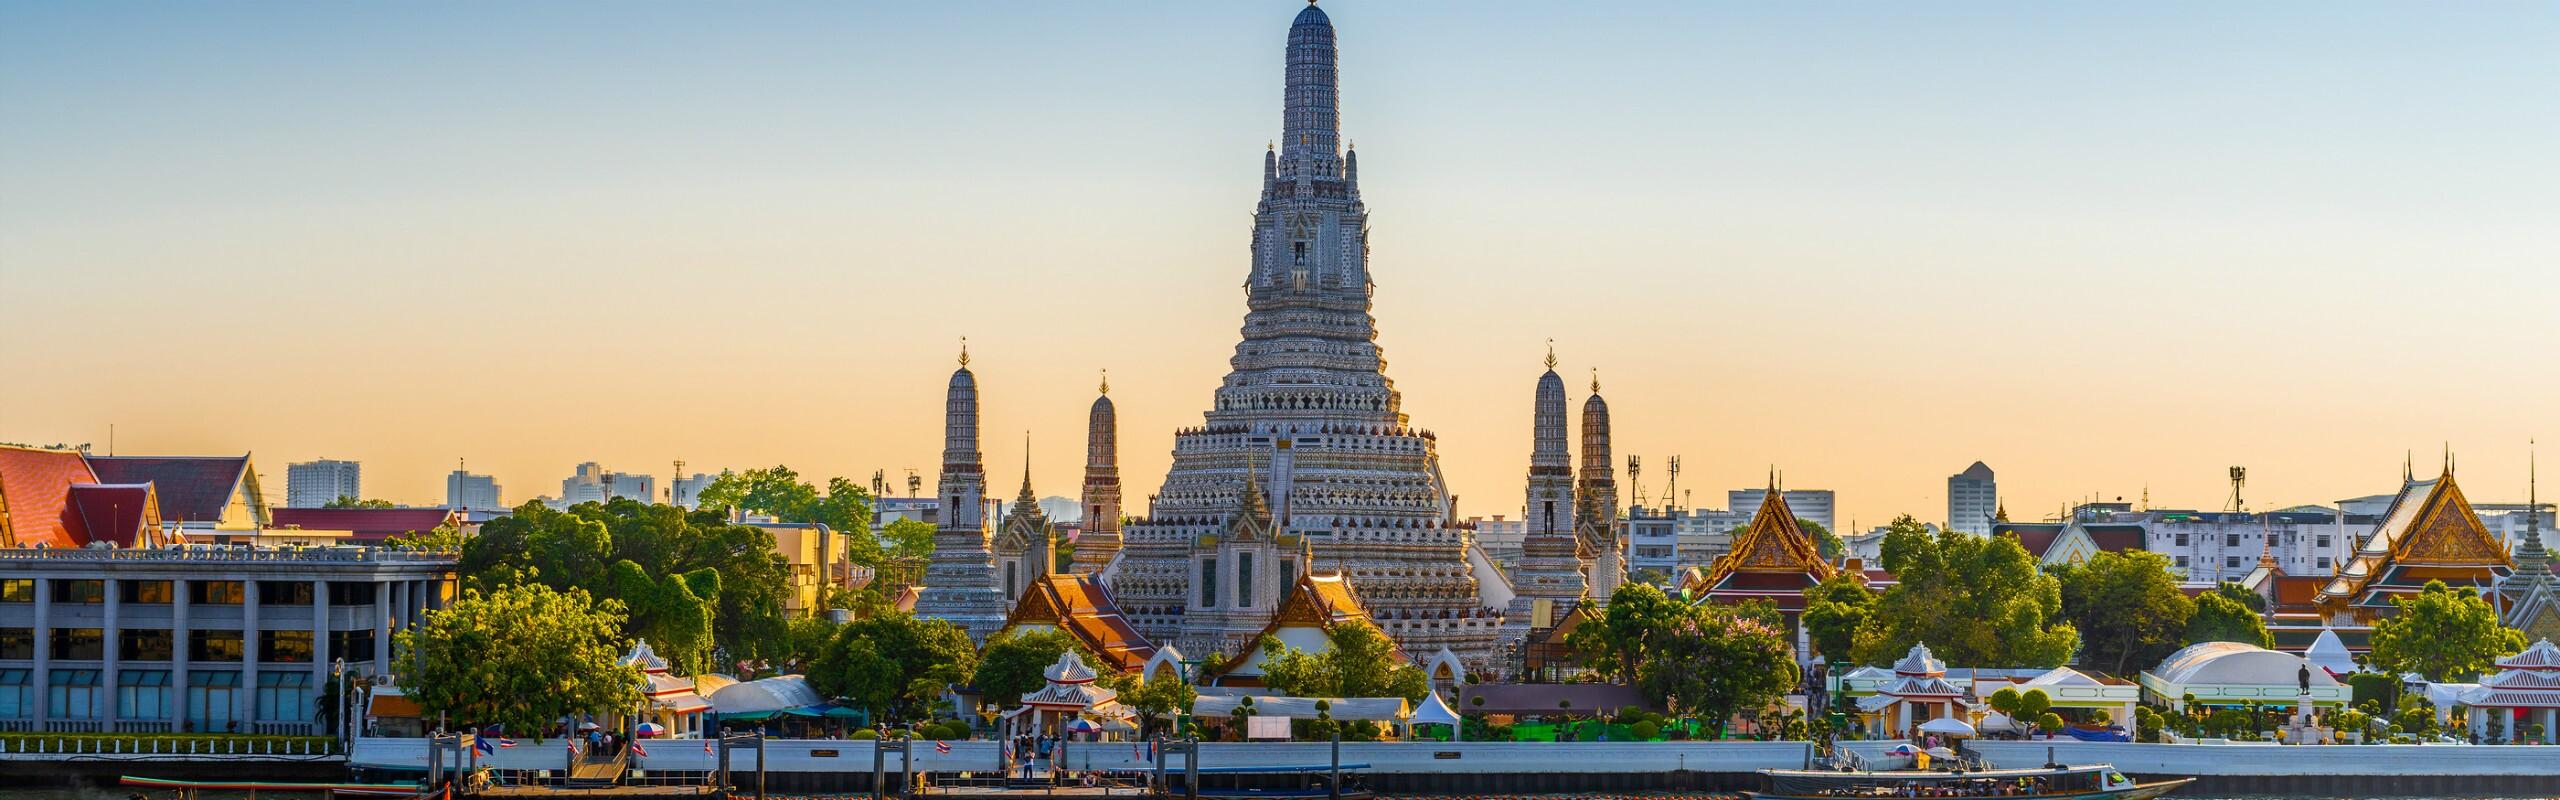 16 Top Things to Do in Bangkok